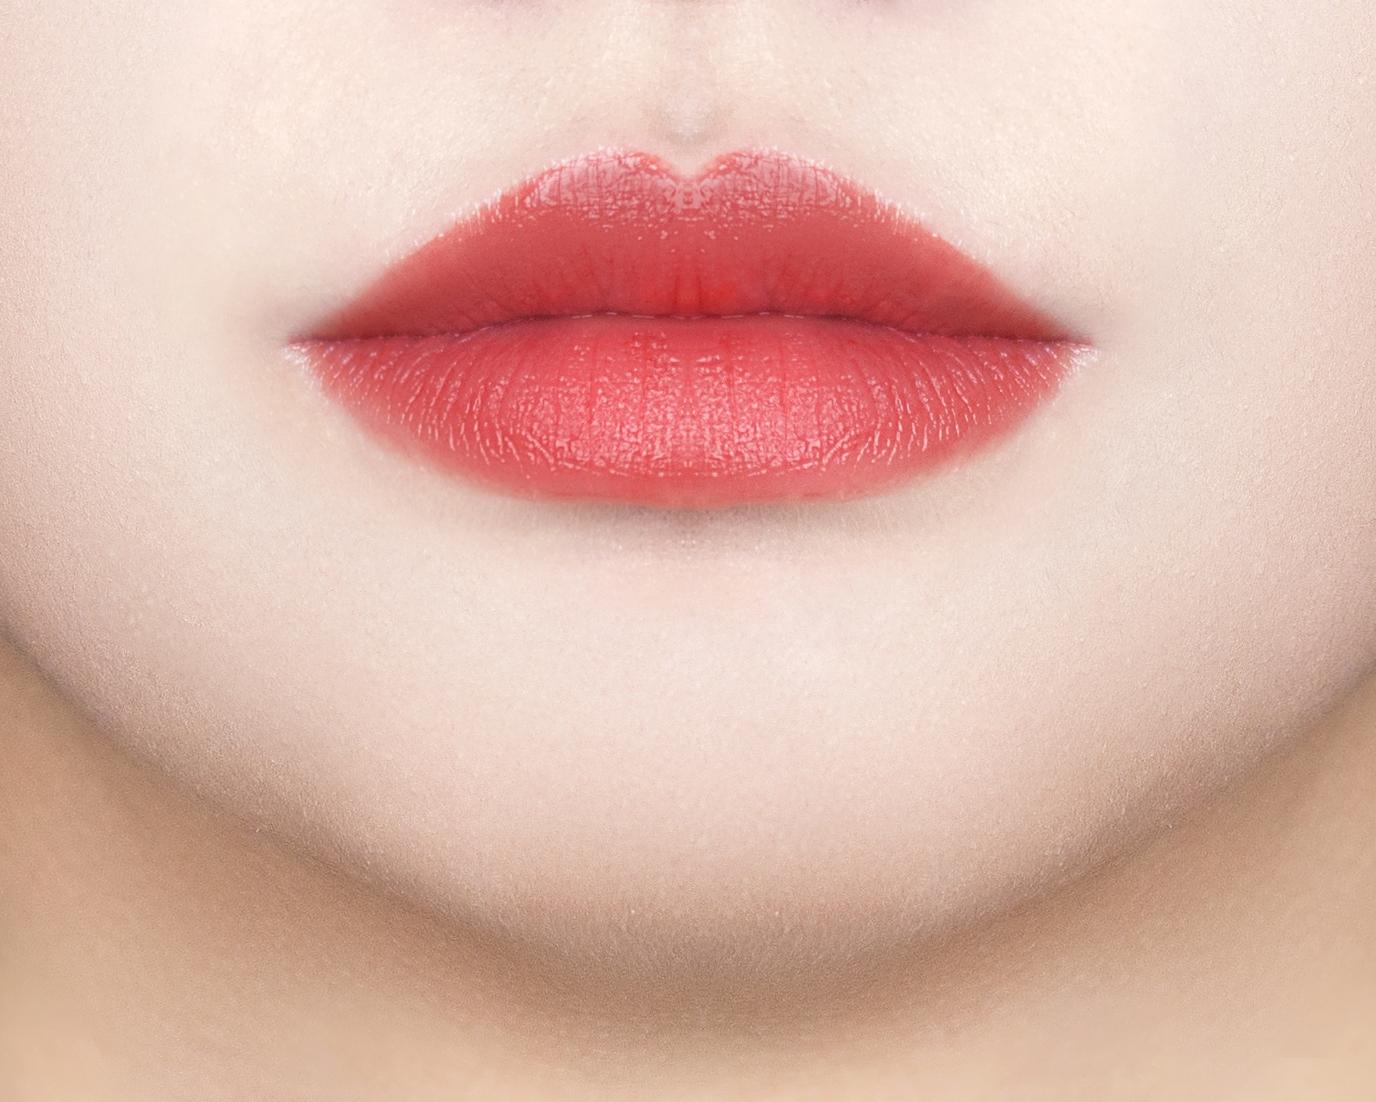 koral_lips.jpg